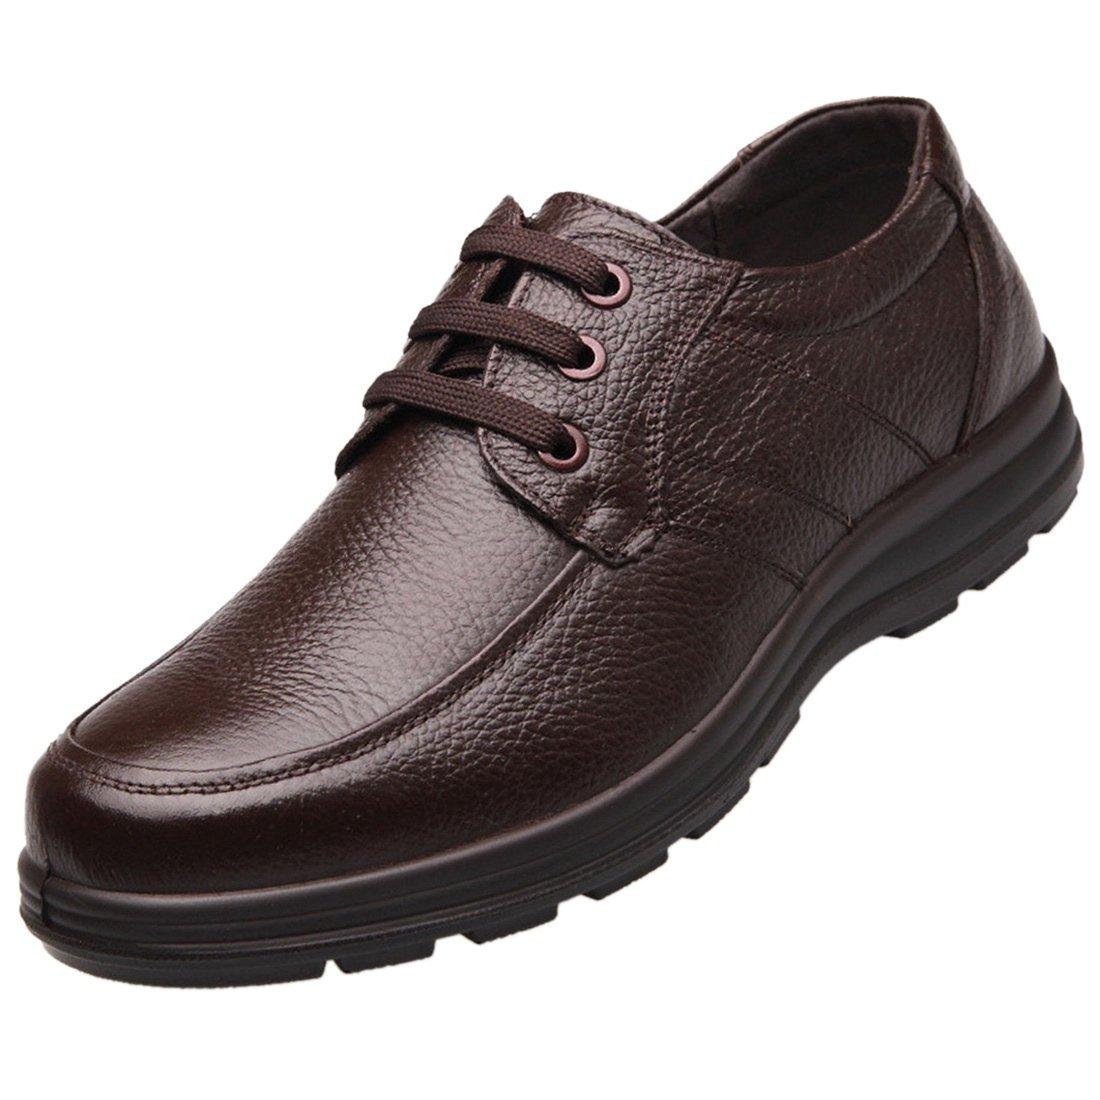 Enerhu Men Lace-up Chef Shoe Leather Flat Work Shoe Nonslip Oil Resistant Waterproof Brown Asian 41/US 8